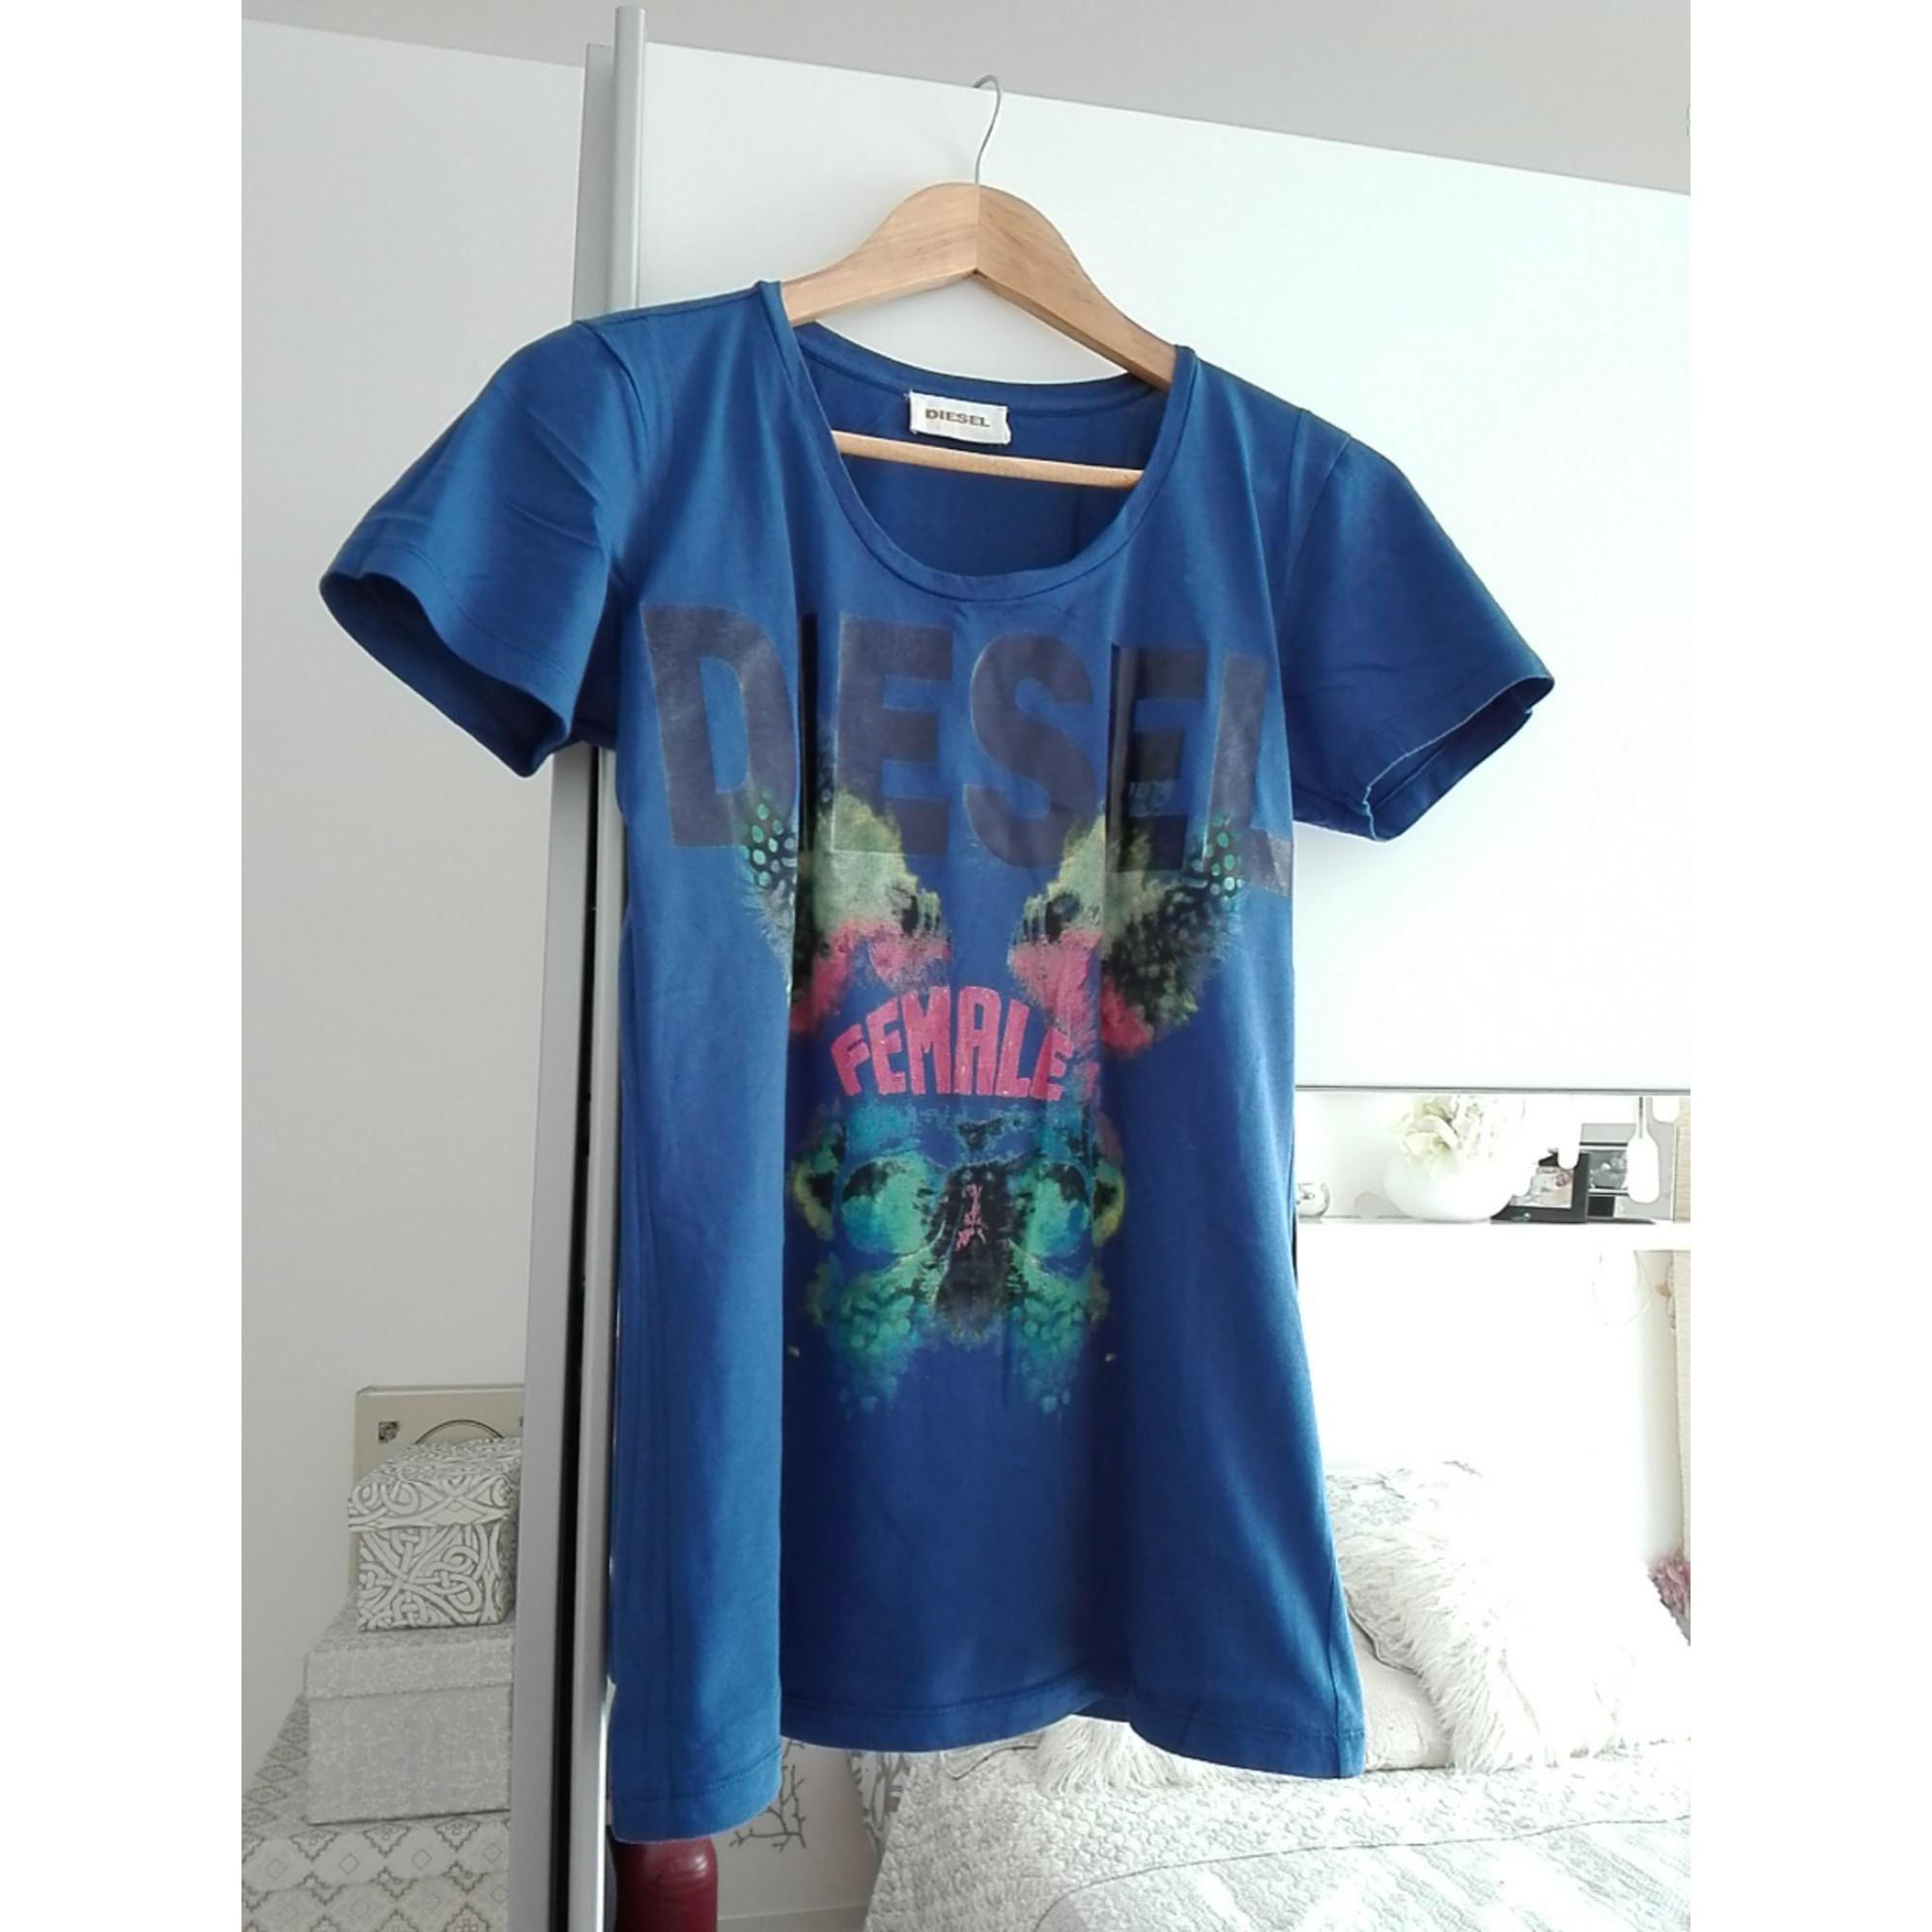 Top, tee-shirt DIESEL Bleu, bleu marine, bleu turquoise